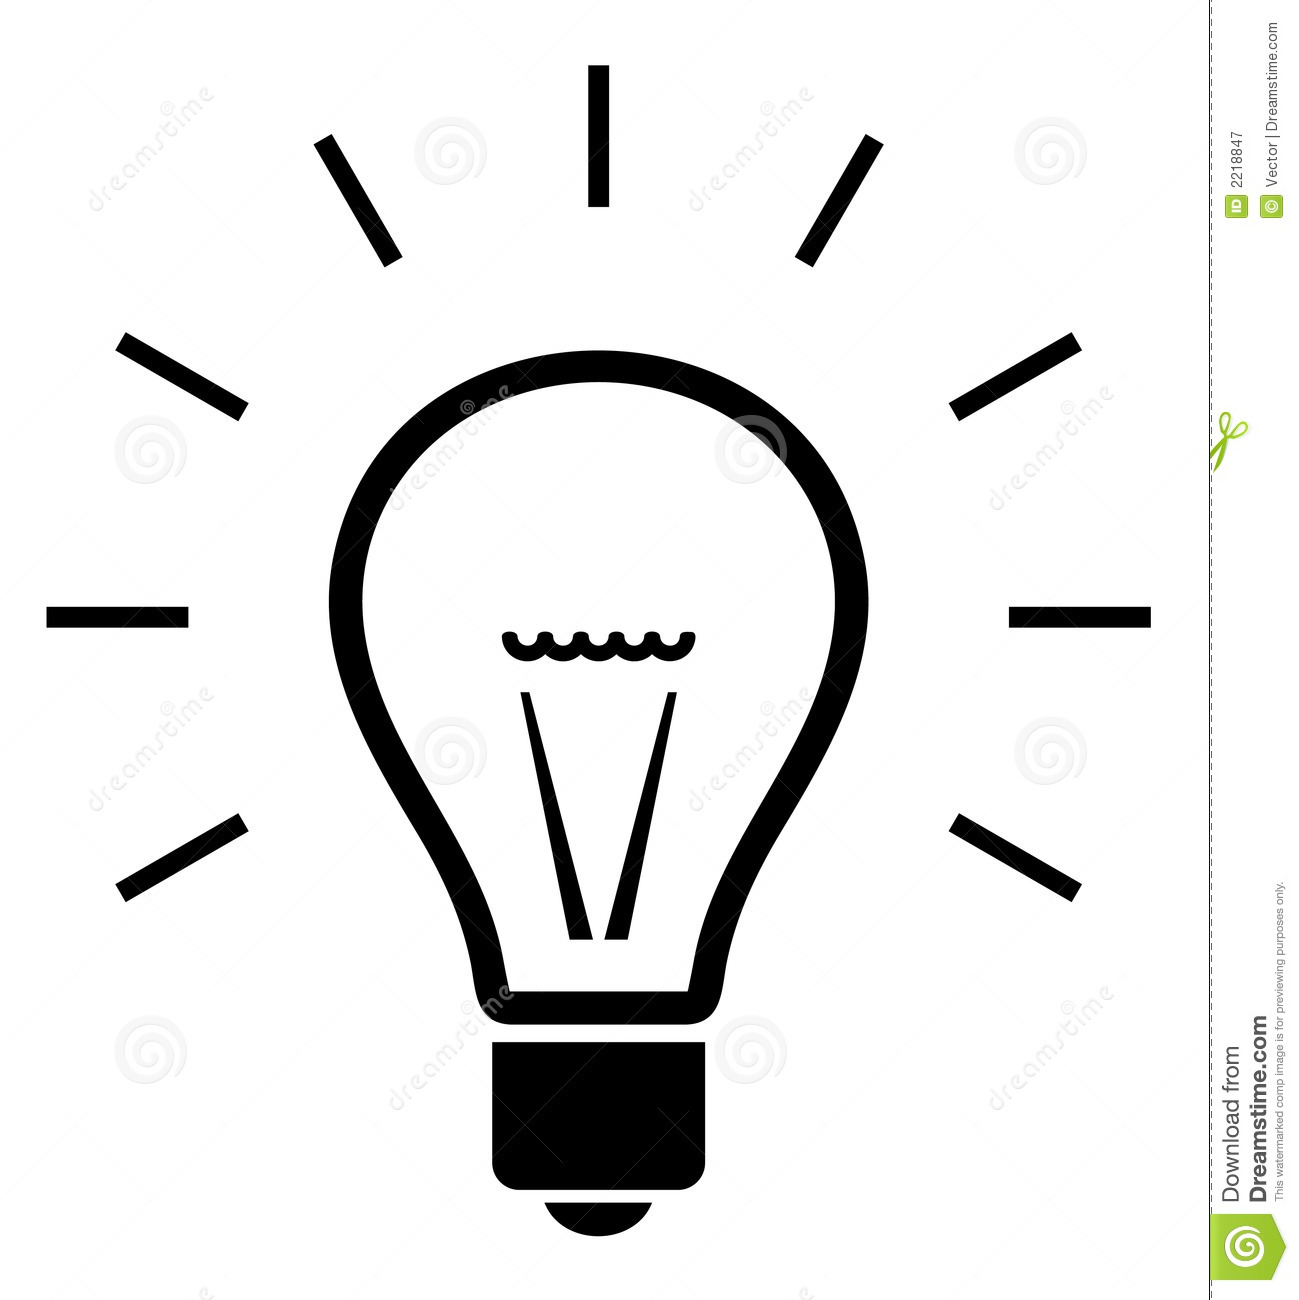 1299x1300 Light Bulb Clipart Black And White